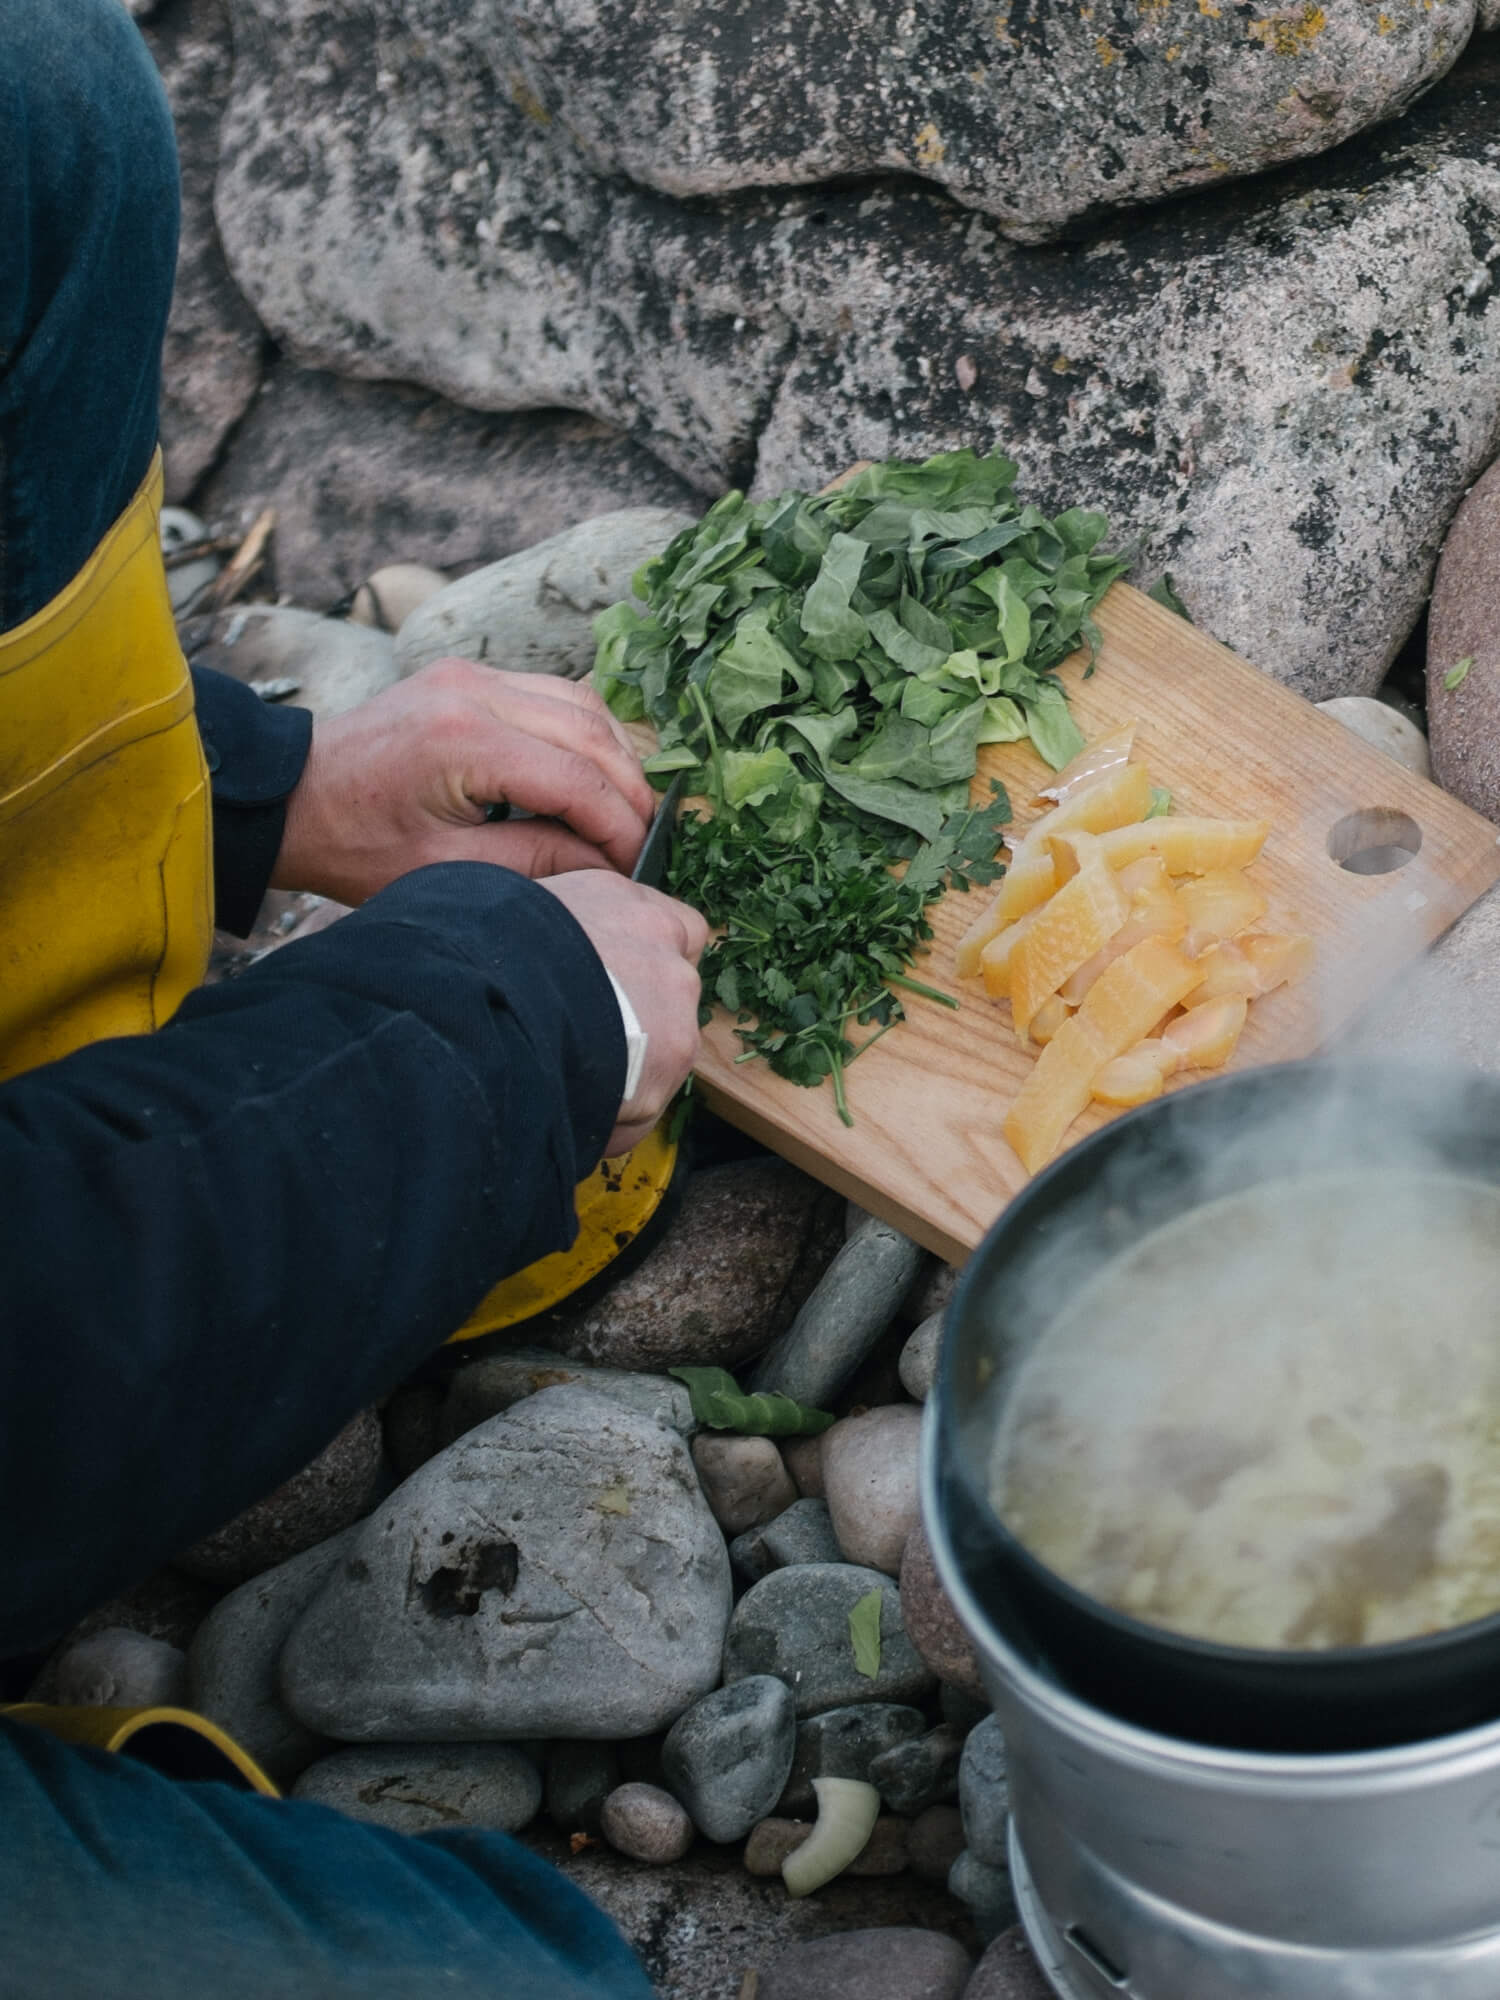 ashley-watson_food-for-the-roadside-10.jpg